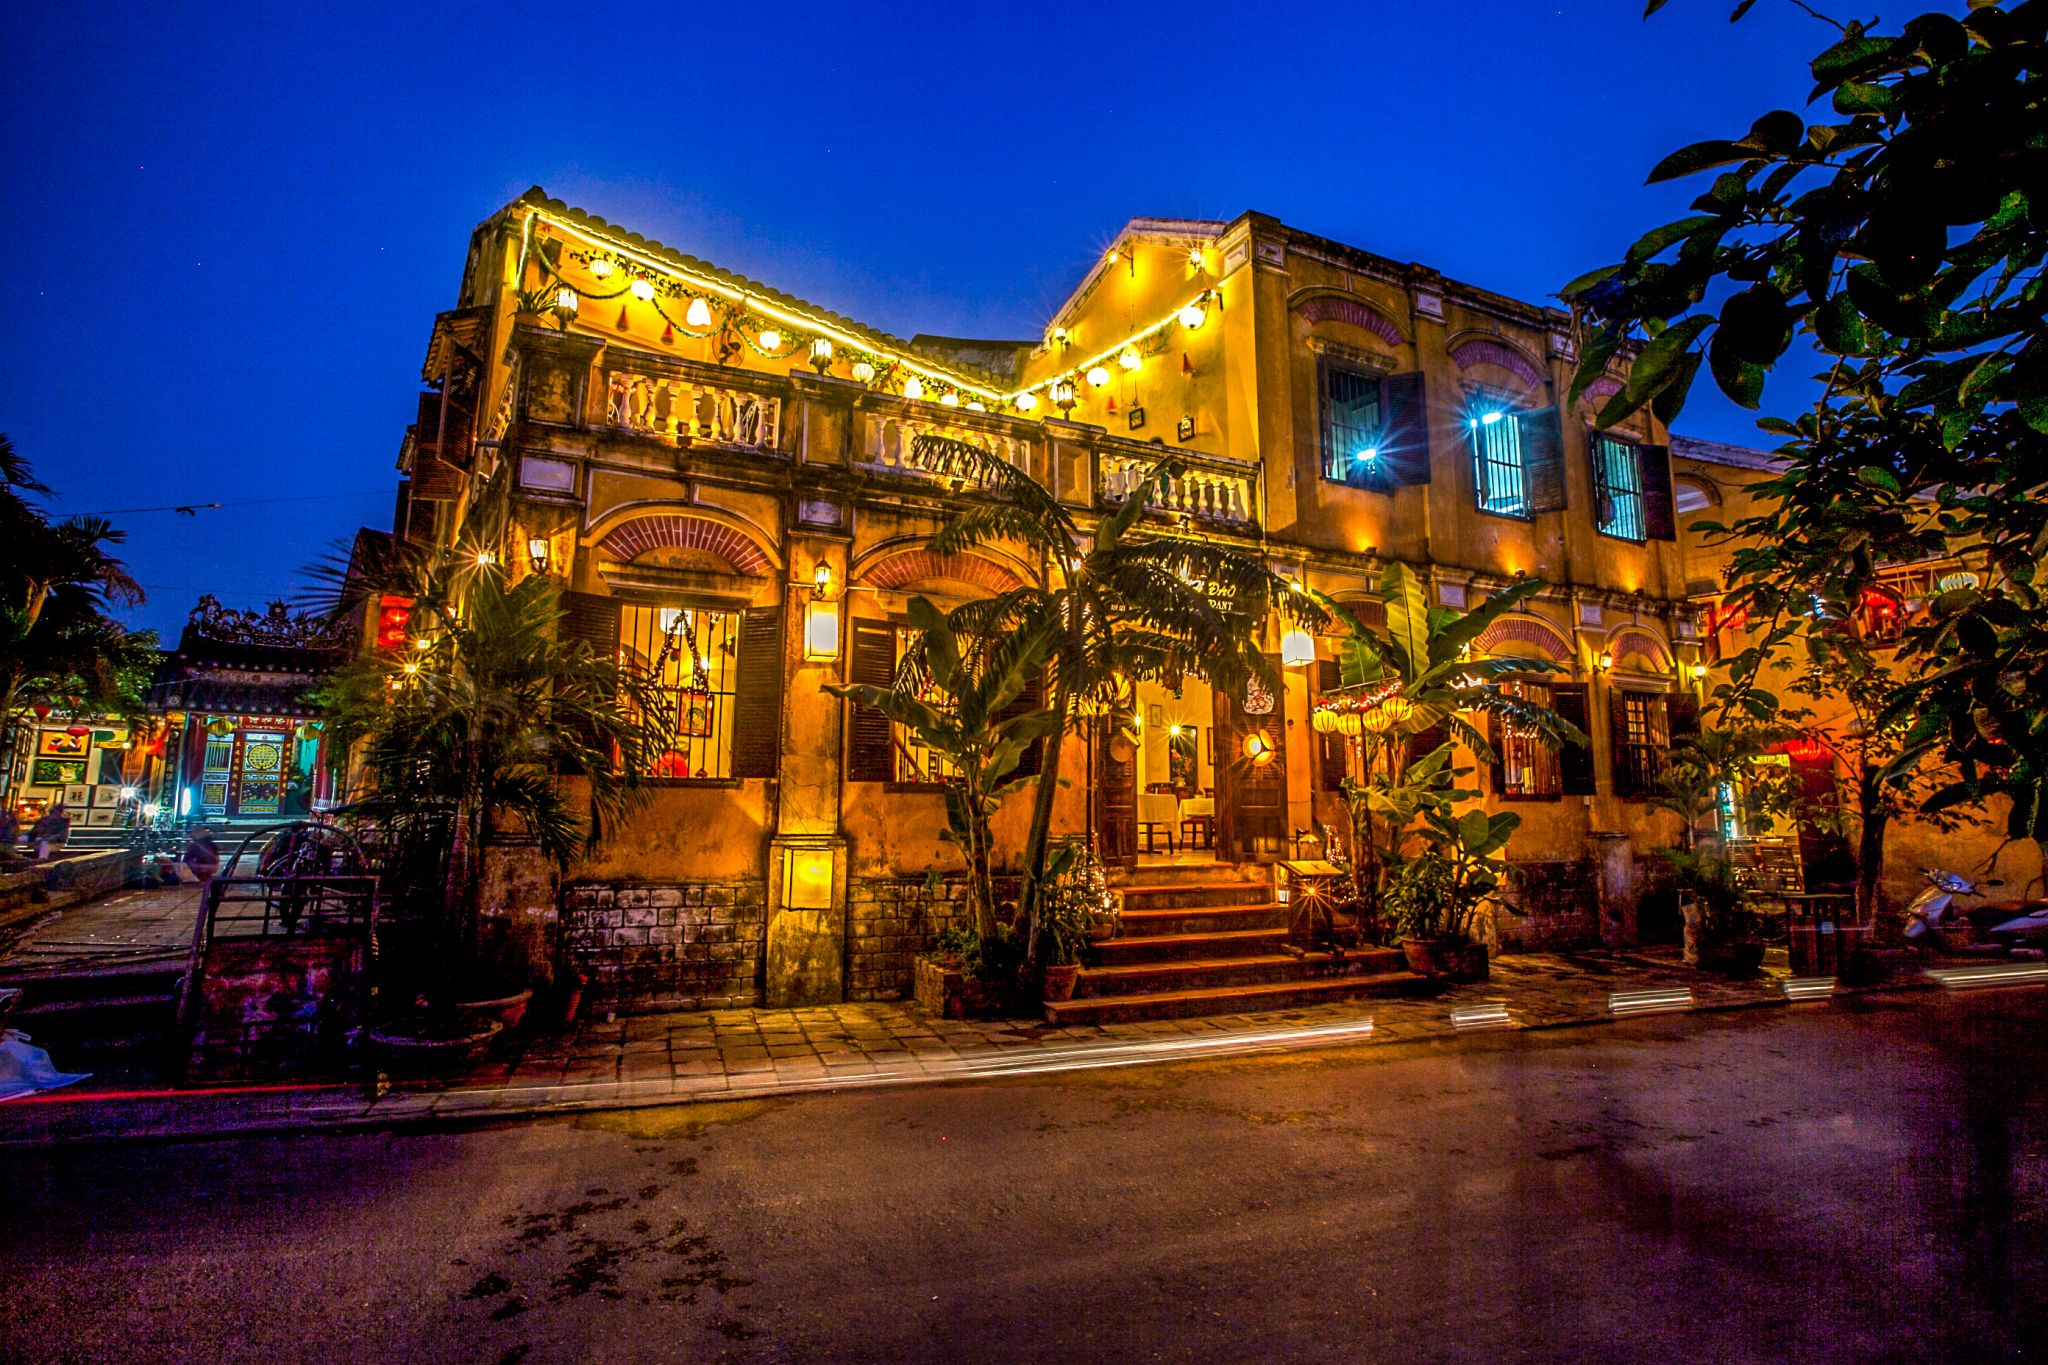 Hoi An Ancient Town at night, Vietnam